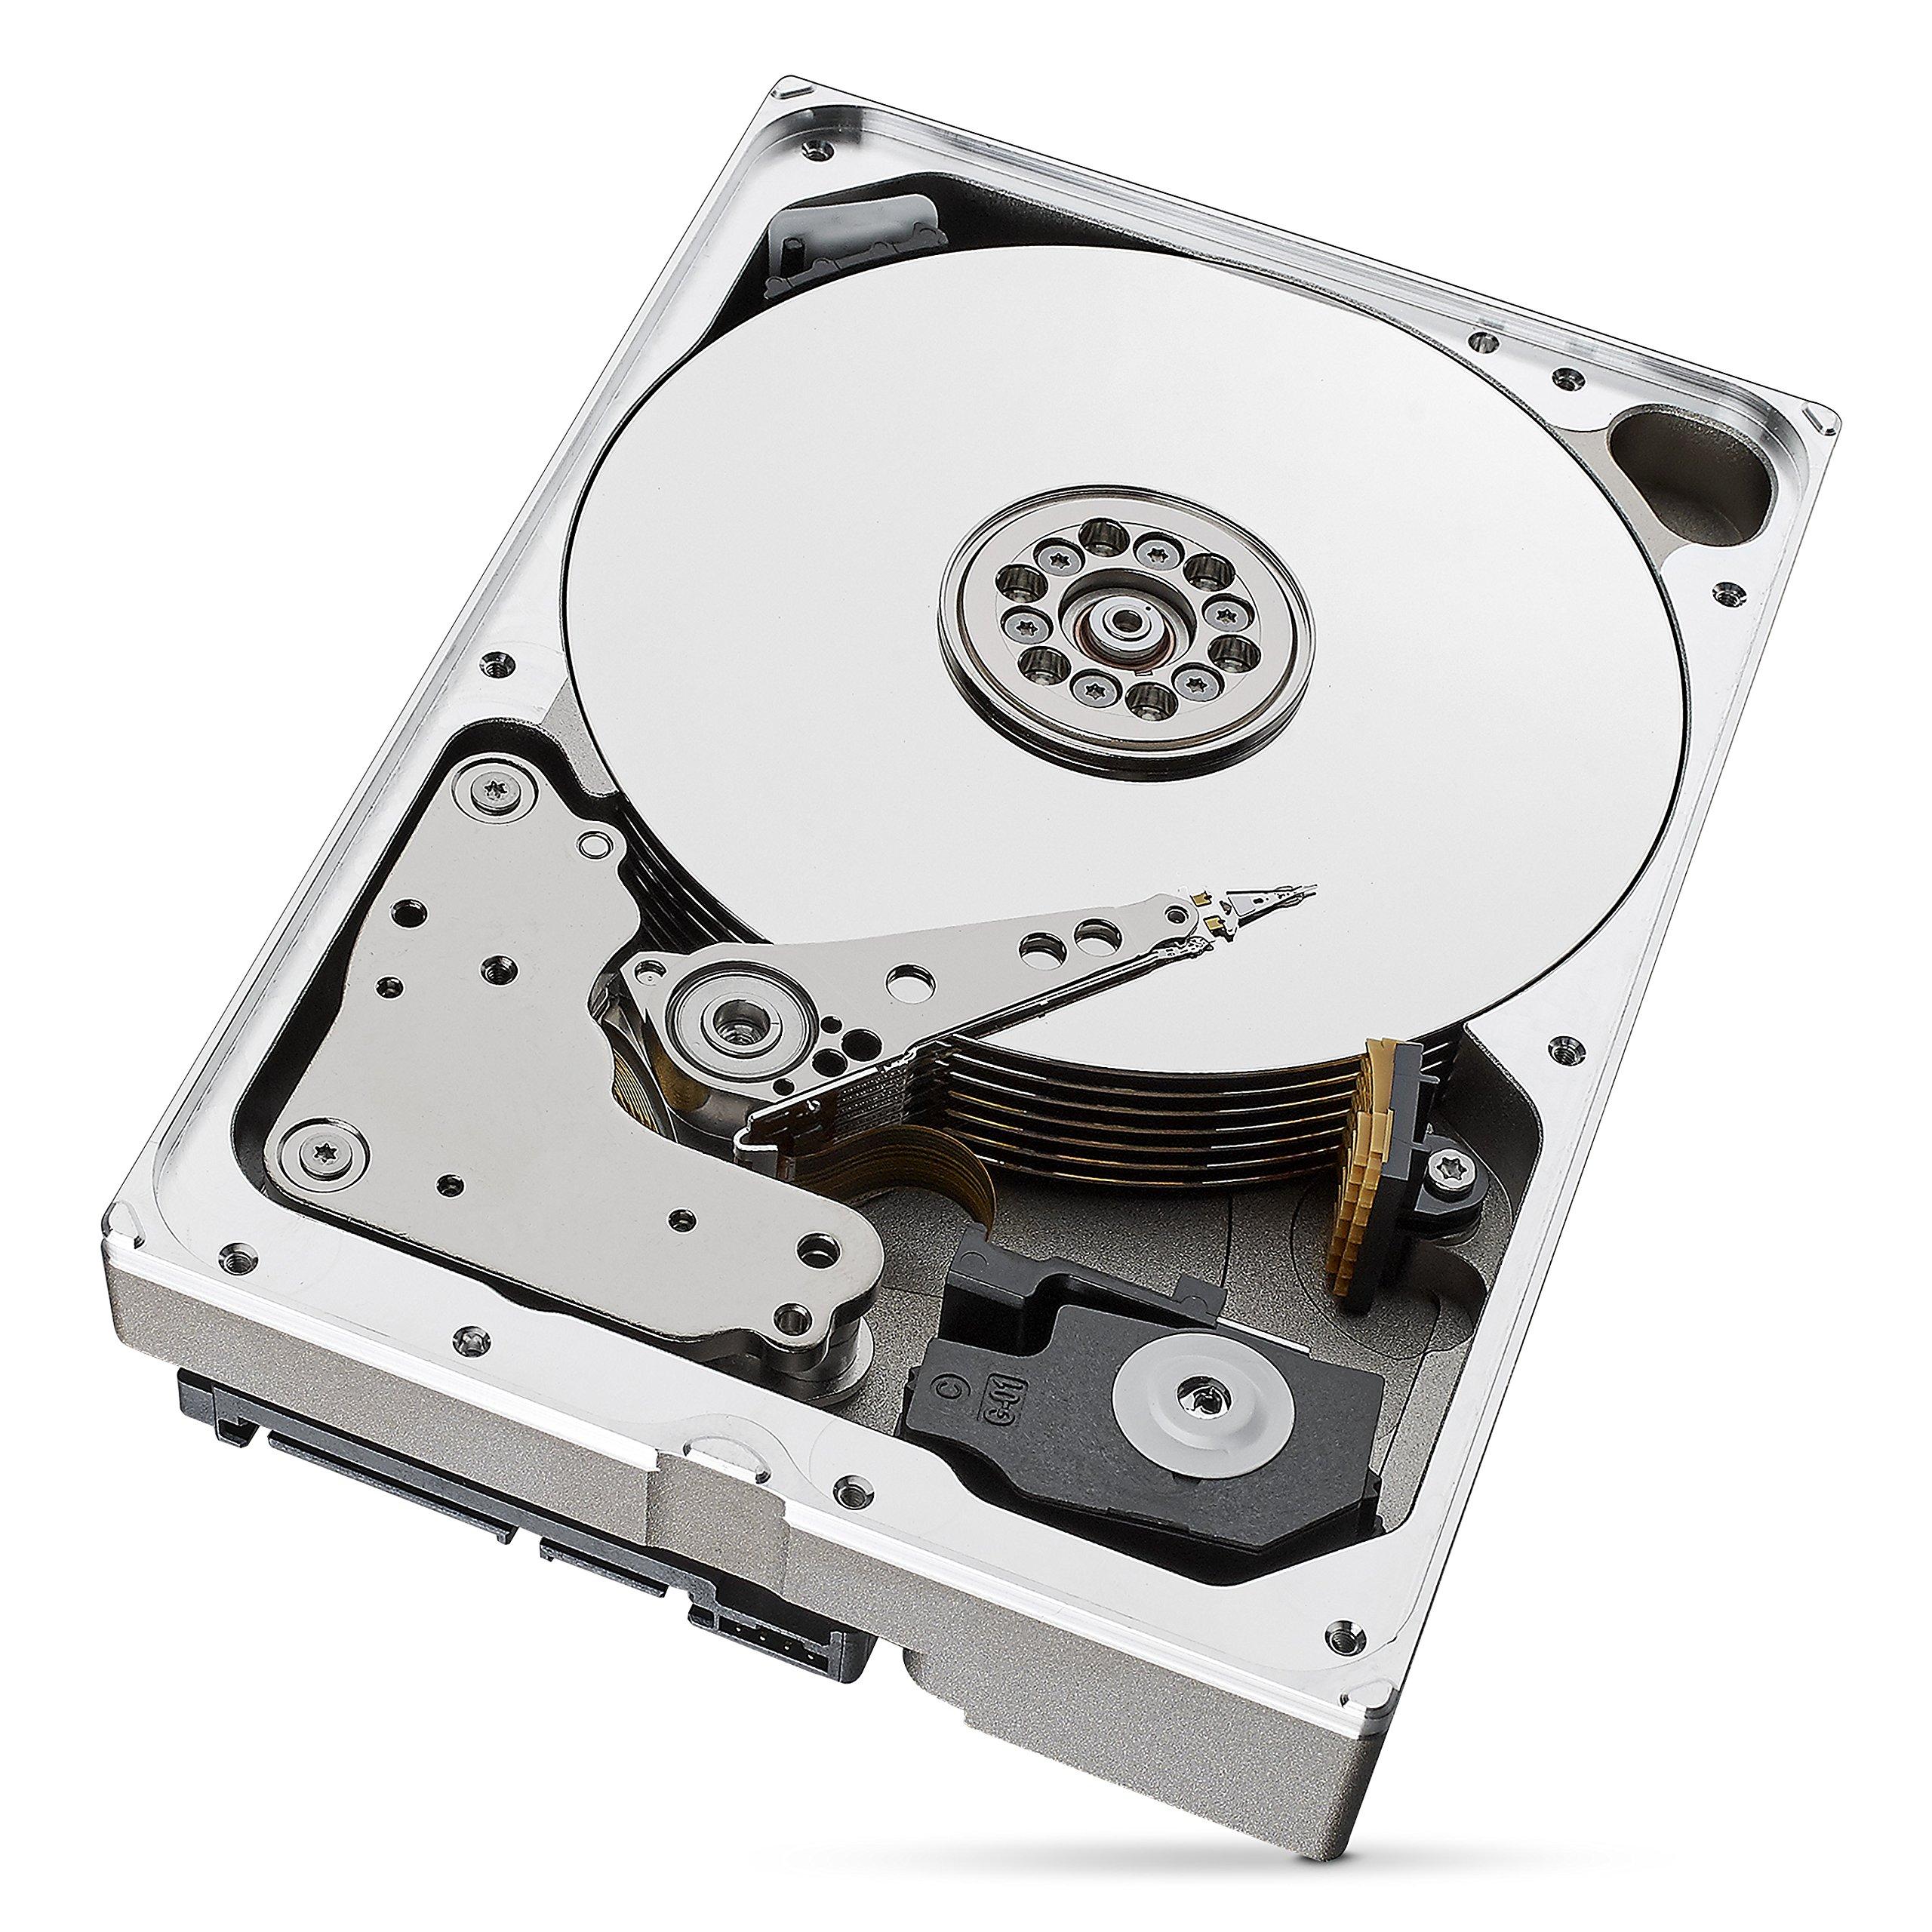 Seagate IronWolf Pro 8 TB NAS RAID Internal Hard Drive - 7,200 RPM SATA 6 Gb/s 3.5-inch (ST8000NE0004) by Seagate (Image #2)